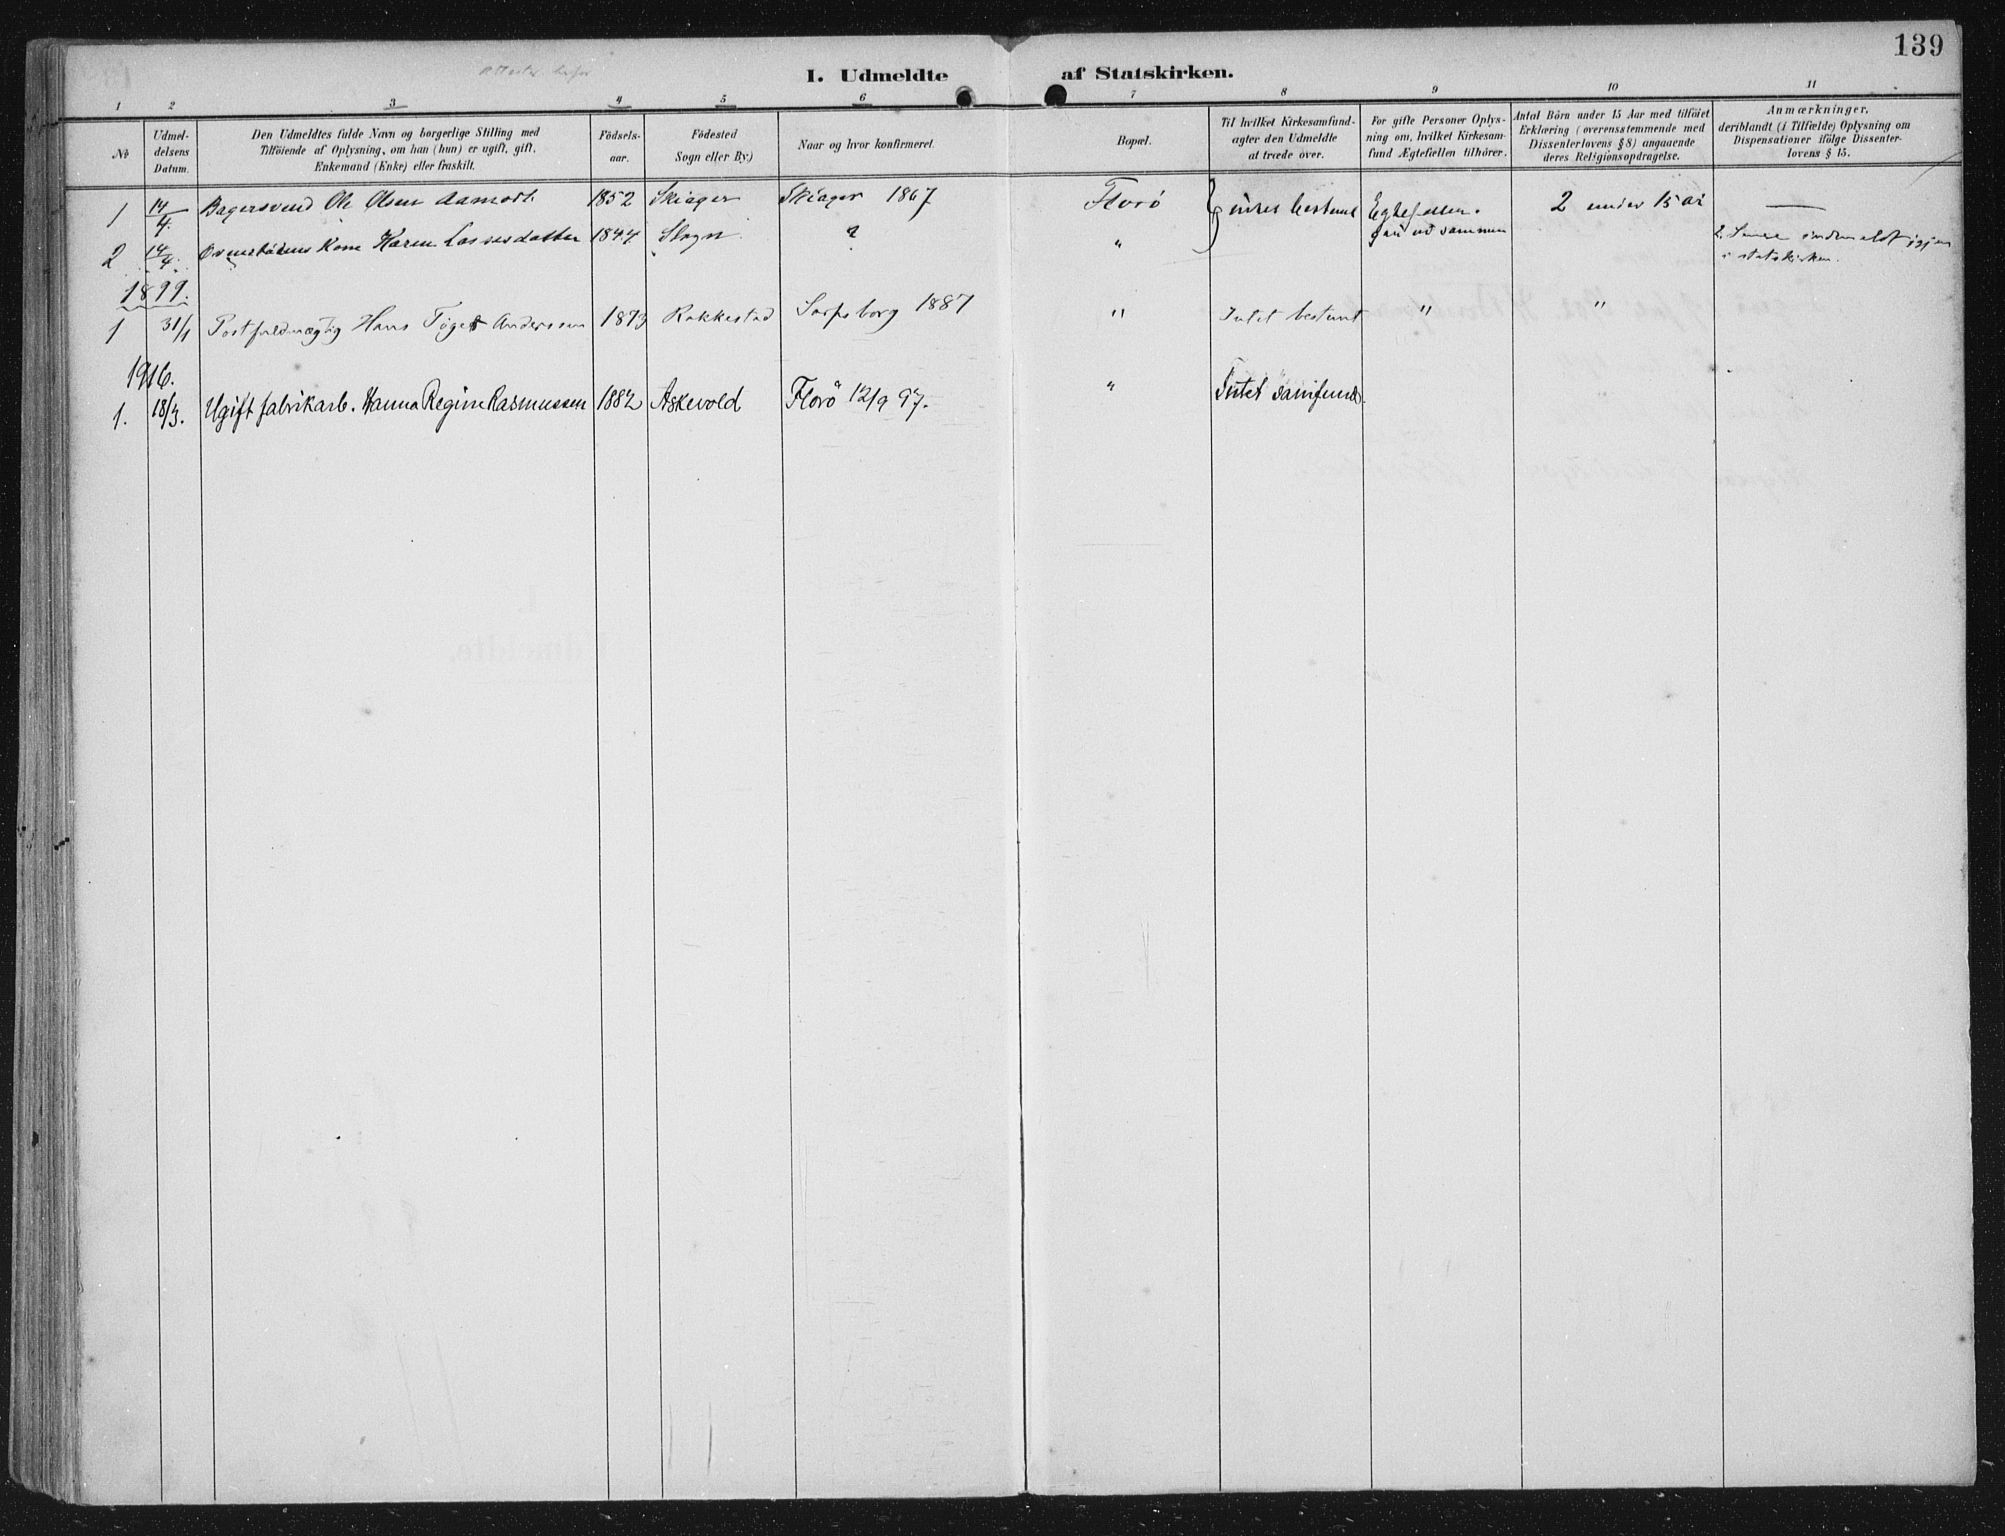 SAB, Kinn sokneprestembete, H/Haa/Haac/L0002: Ministerialbok nr. C  2, 1895-1916, s. 139